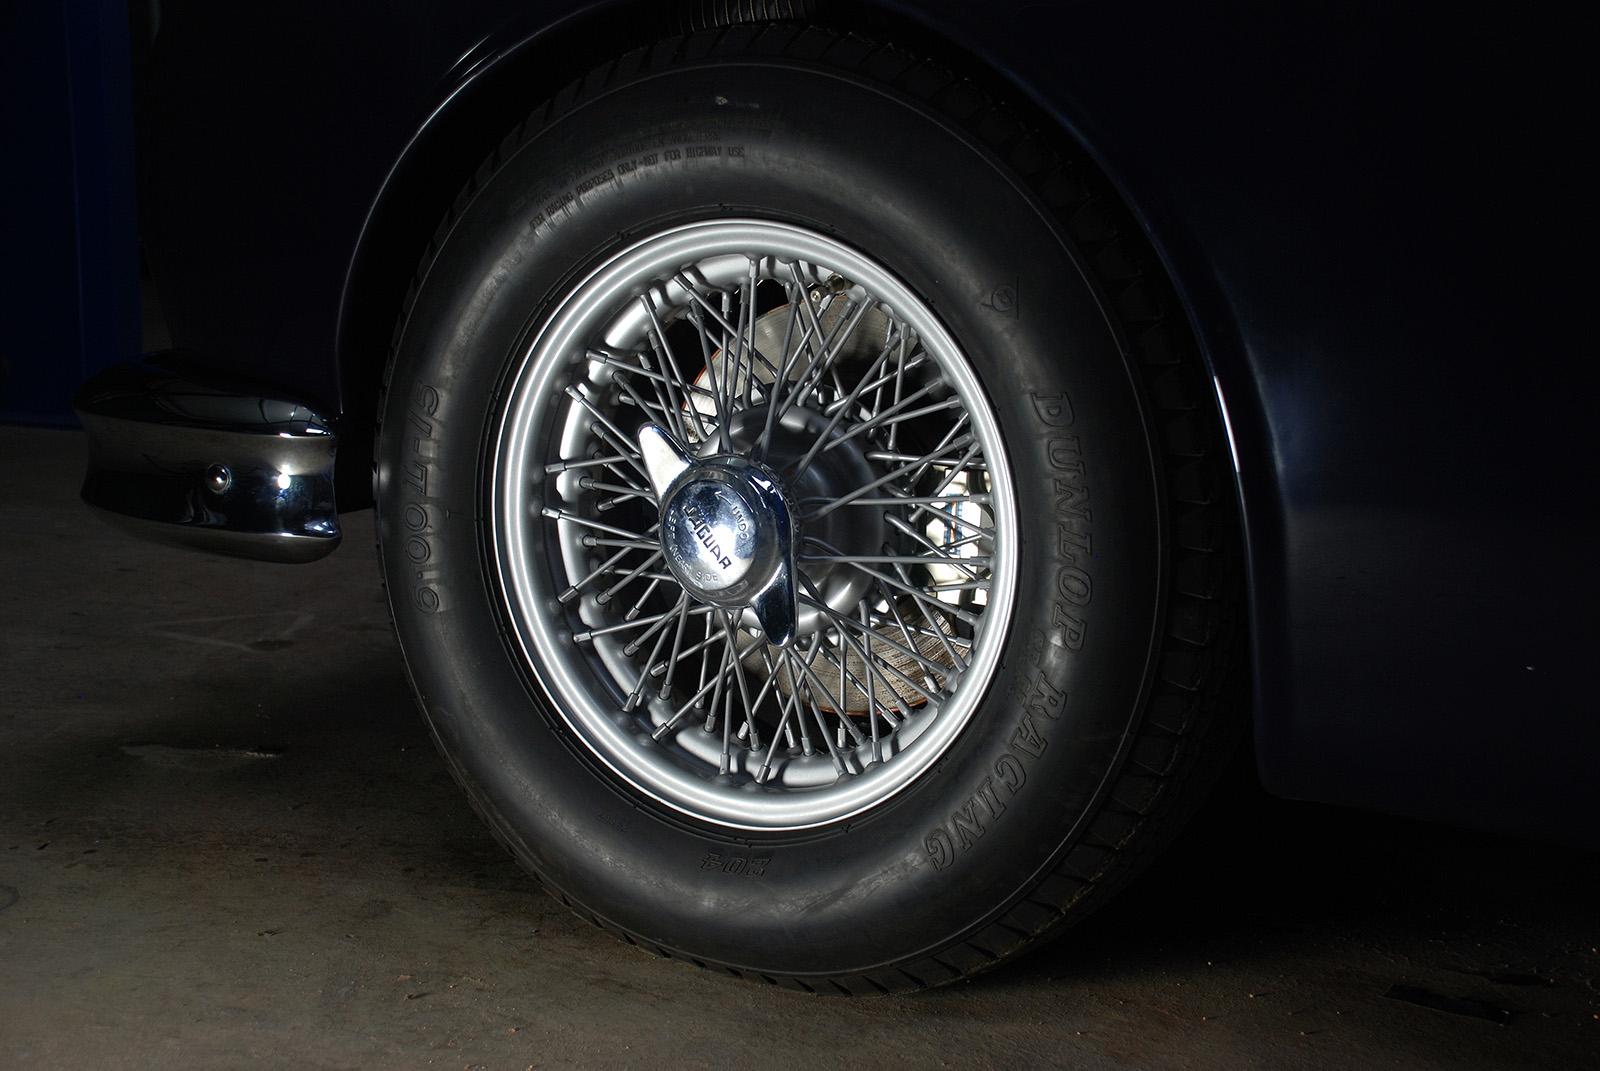 1959 bscc_Jaguar_competition_mk I_sayer selection_scragg_wilkinson_iva400_web_4.jpg